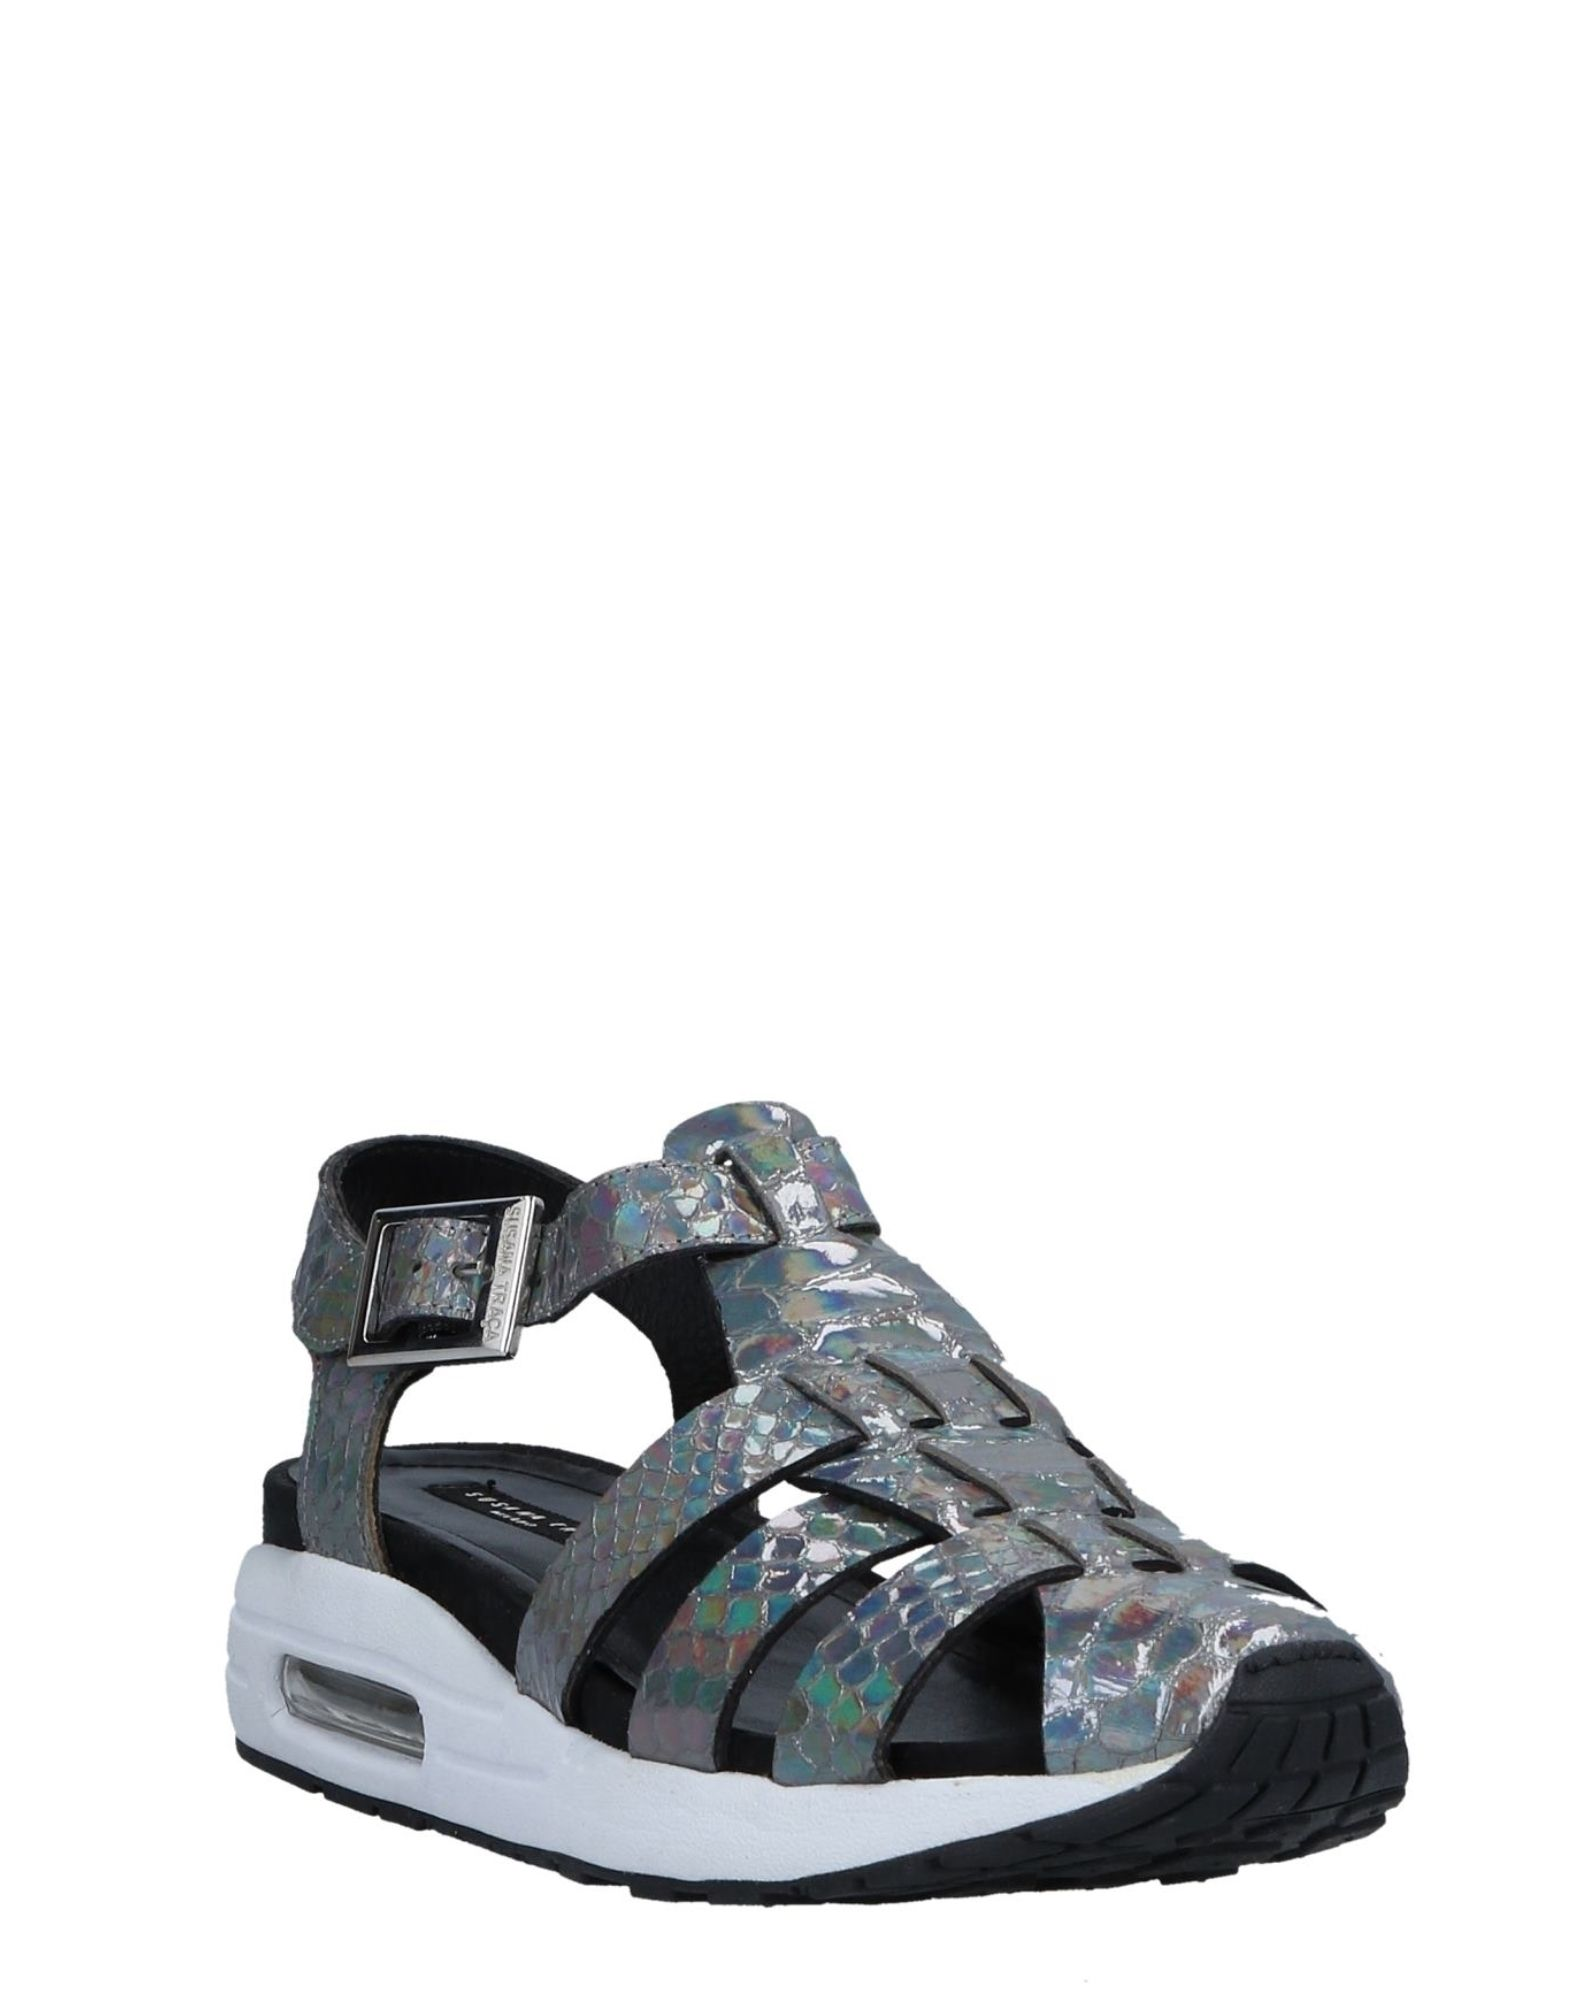 Gut um billige billige billige Schuhe zu tragenSusana Traca Sandalen Damen  11514375GP b27ecc